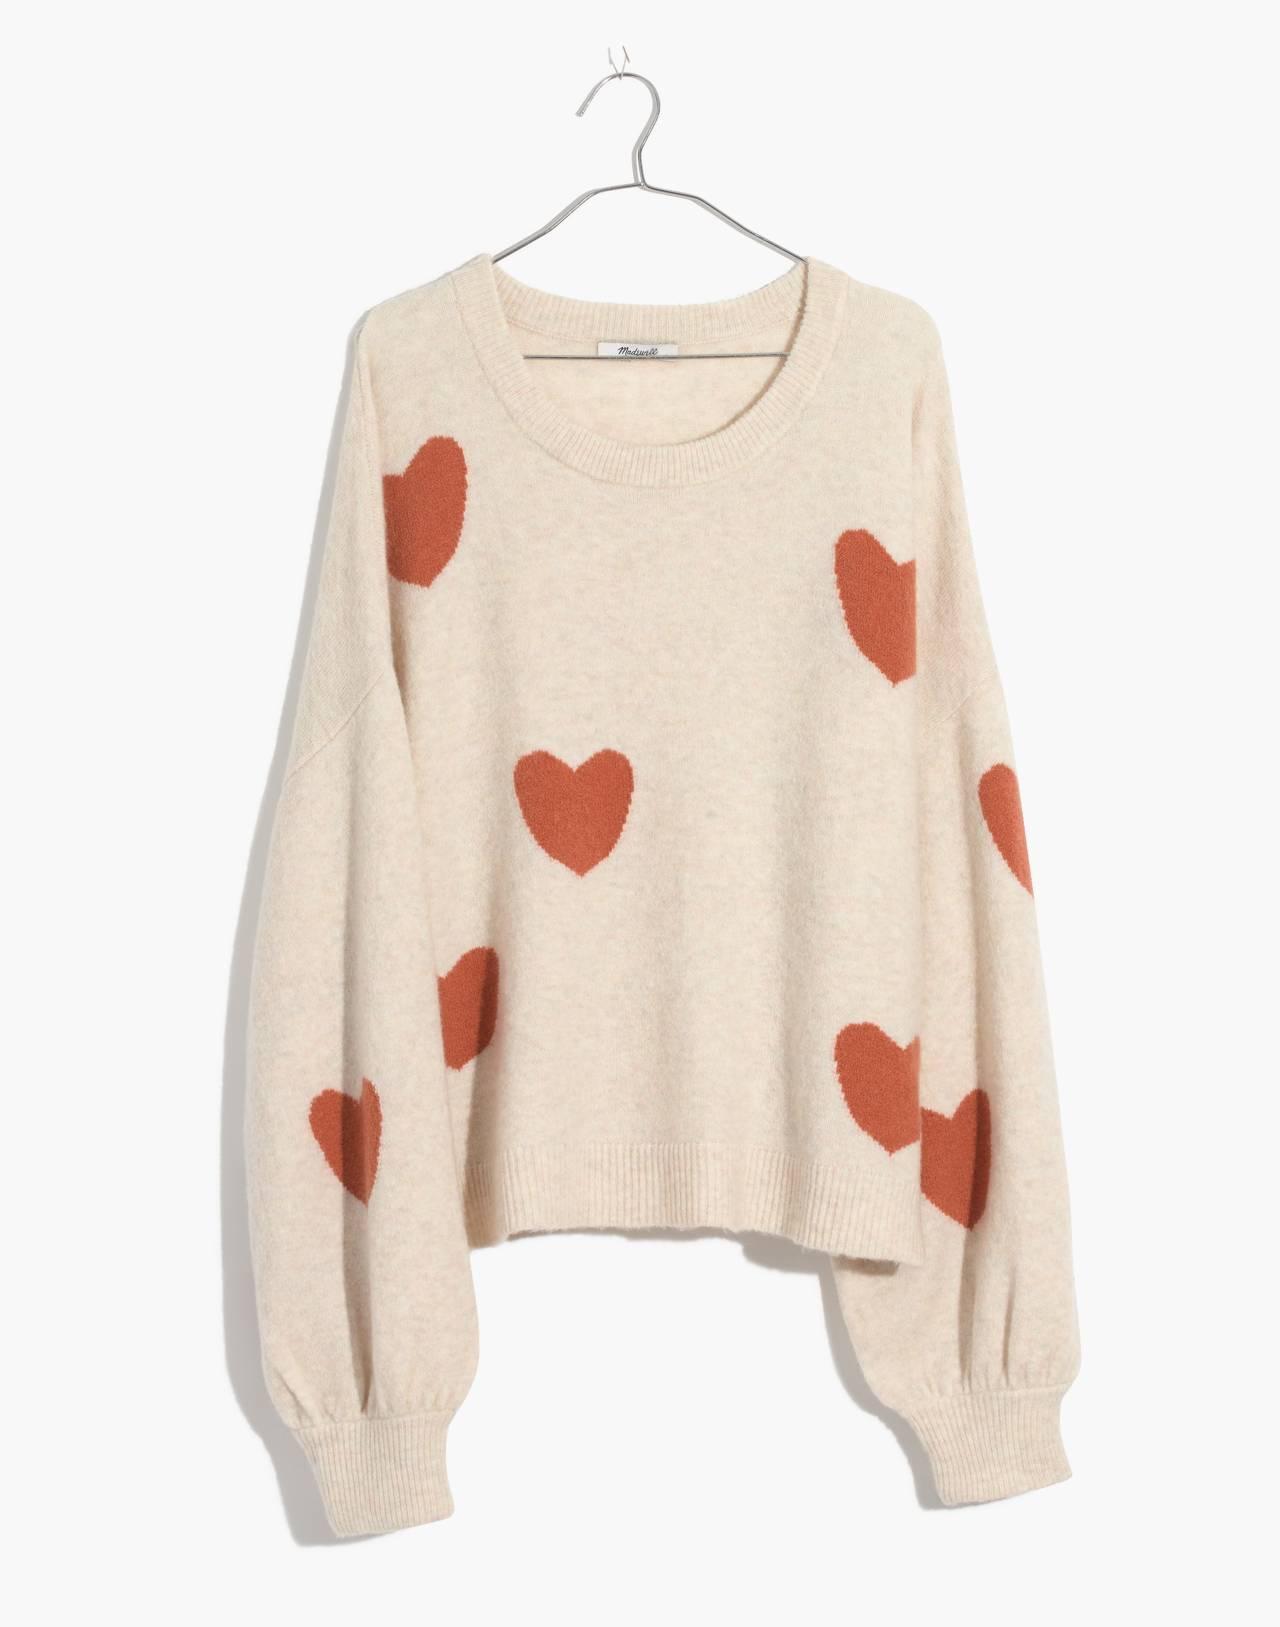 Heart Dot Balloon-Sleeve Pullover Sweater in heather smoke image 4